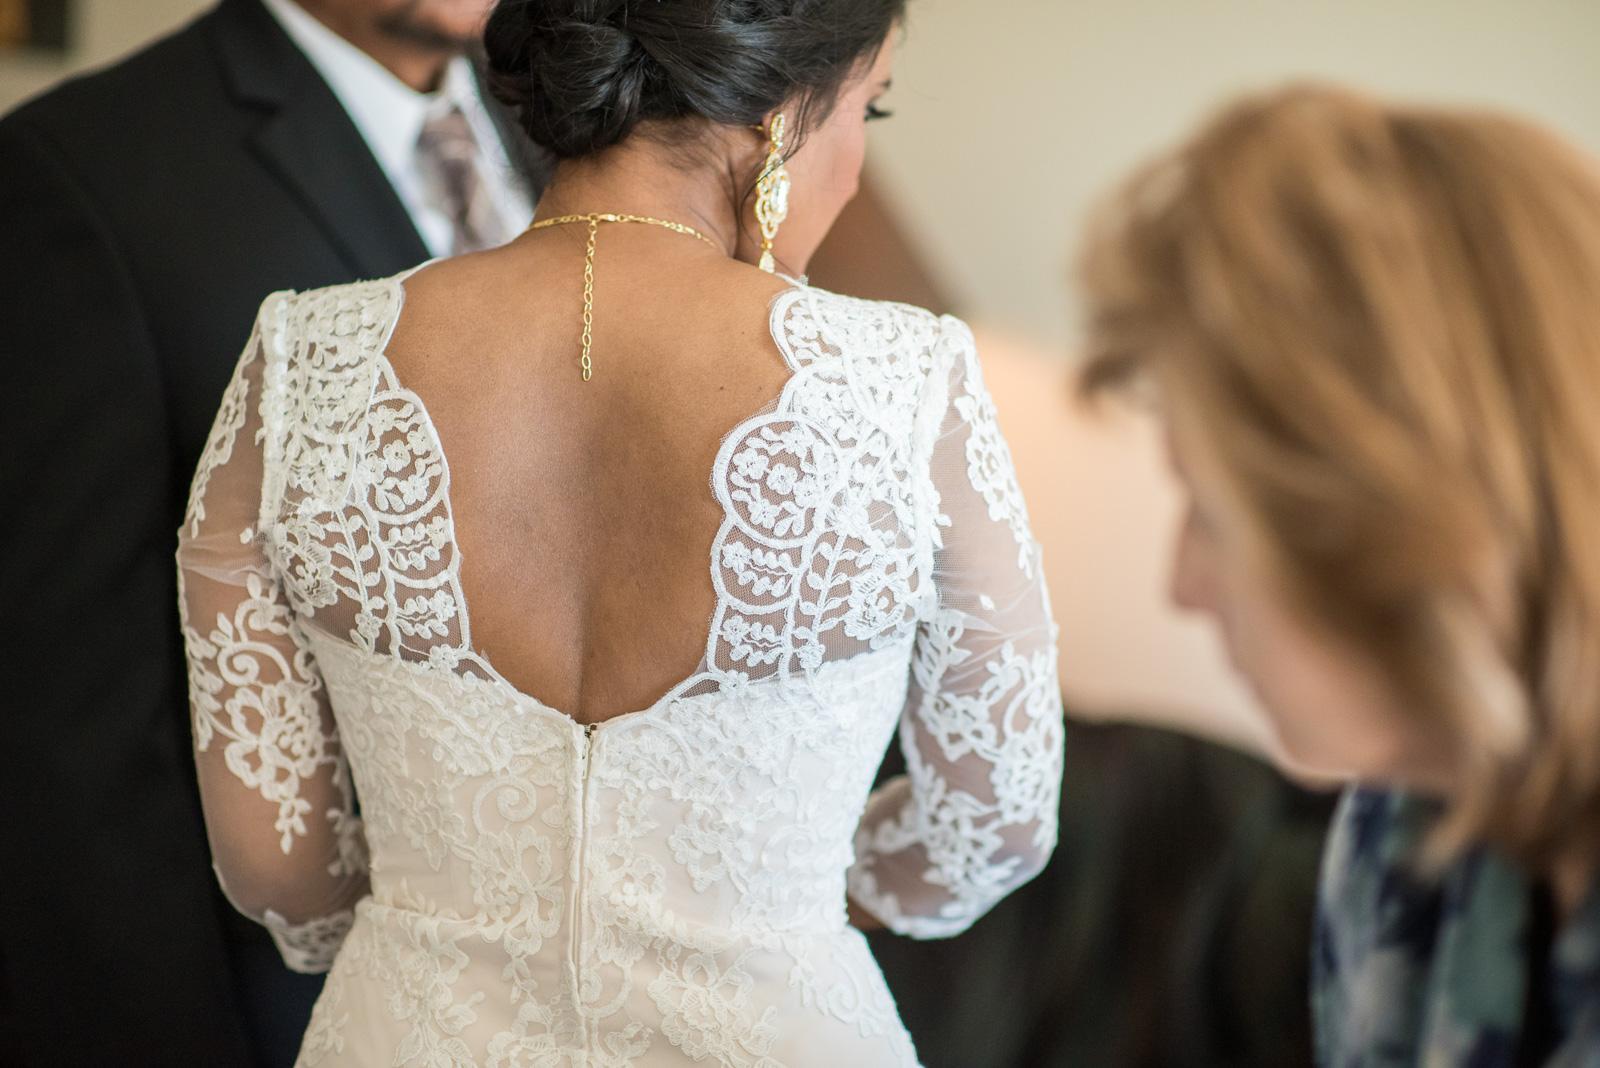 bc-wedding-photographers-paradise-banquet-hall-wedding-5.jpg